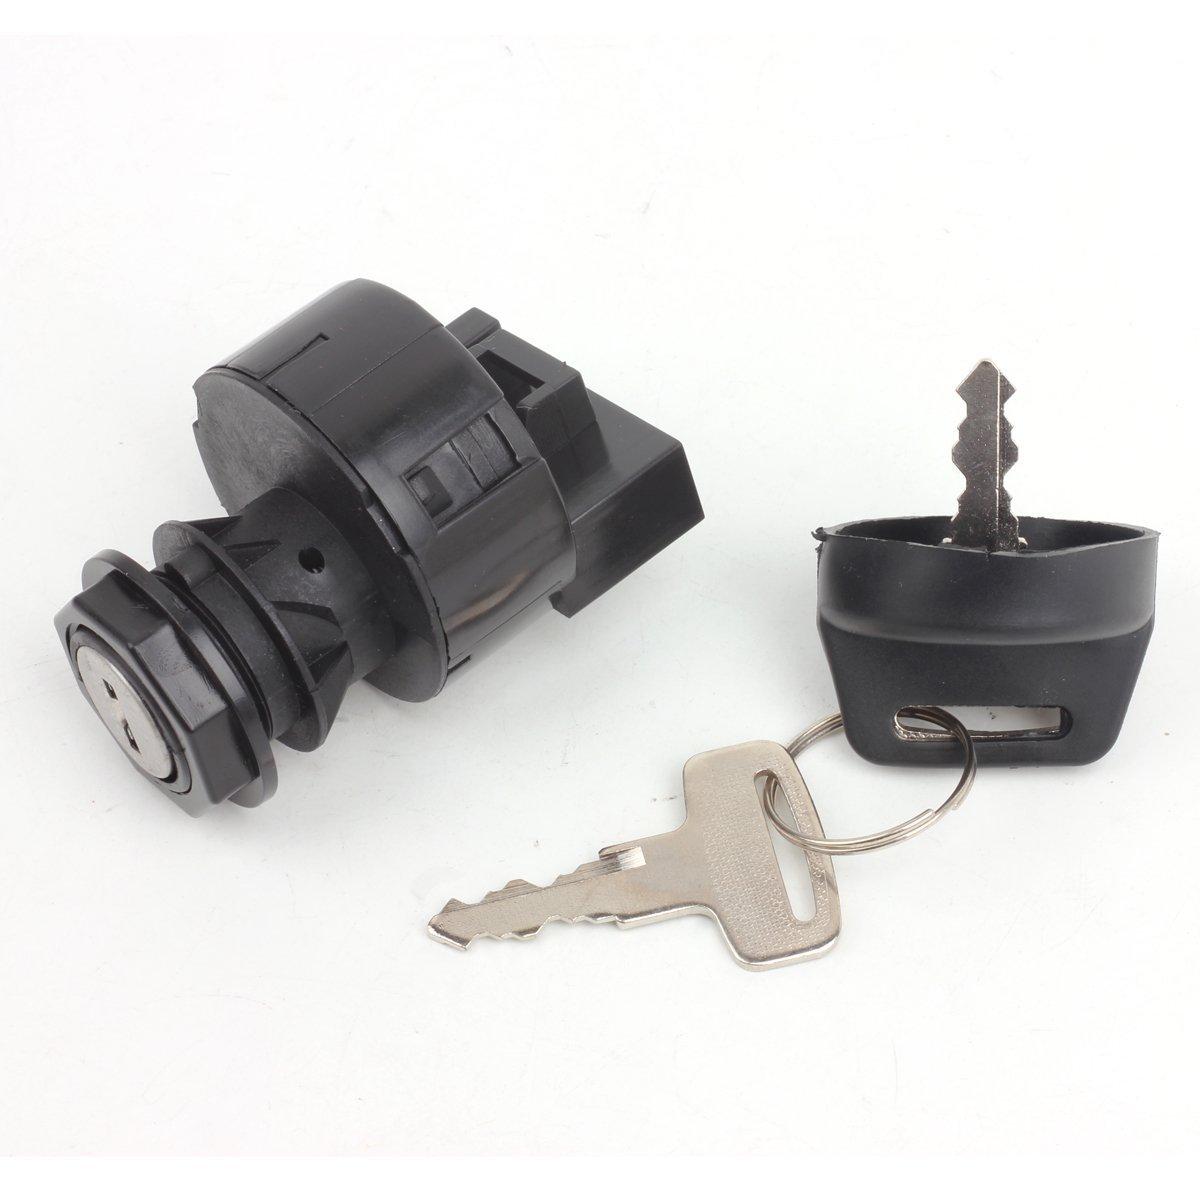 Ignition Key Switch For 2010 2011 2012 2013 Polaris Ranger 400 500 800 4x4 Crew